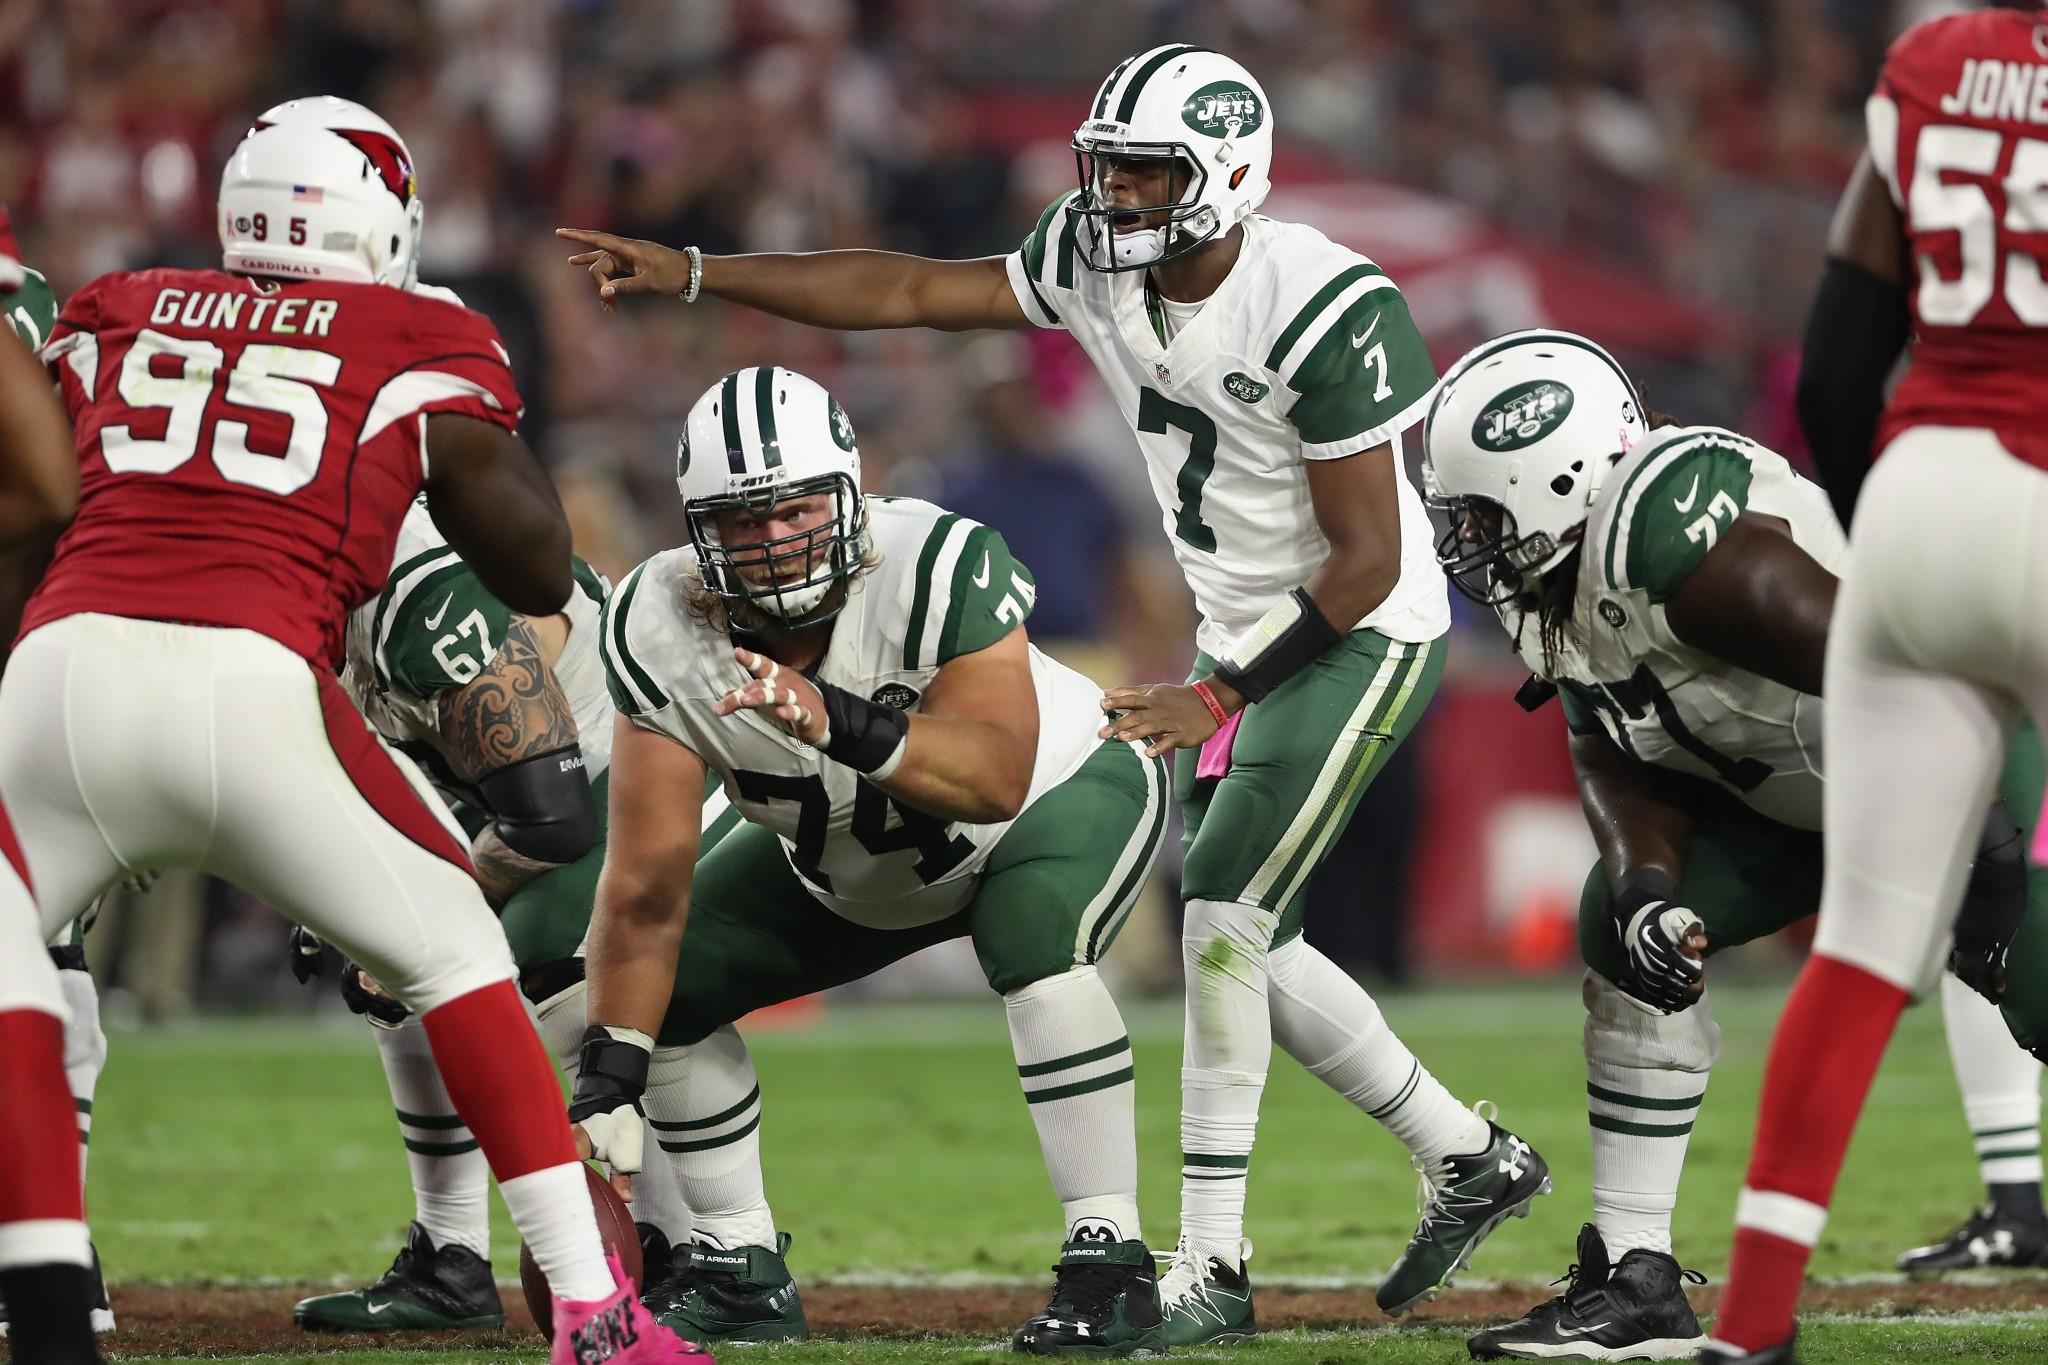 Report: Jets to bench Ryan Fitzpatrick, name Geno Smith starter